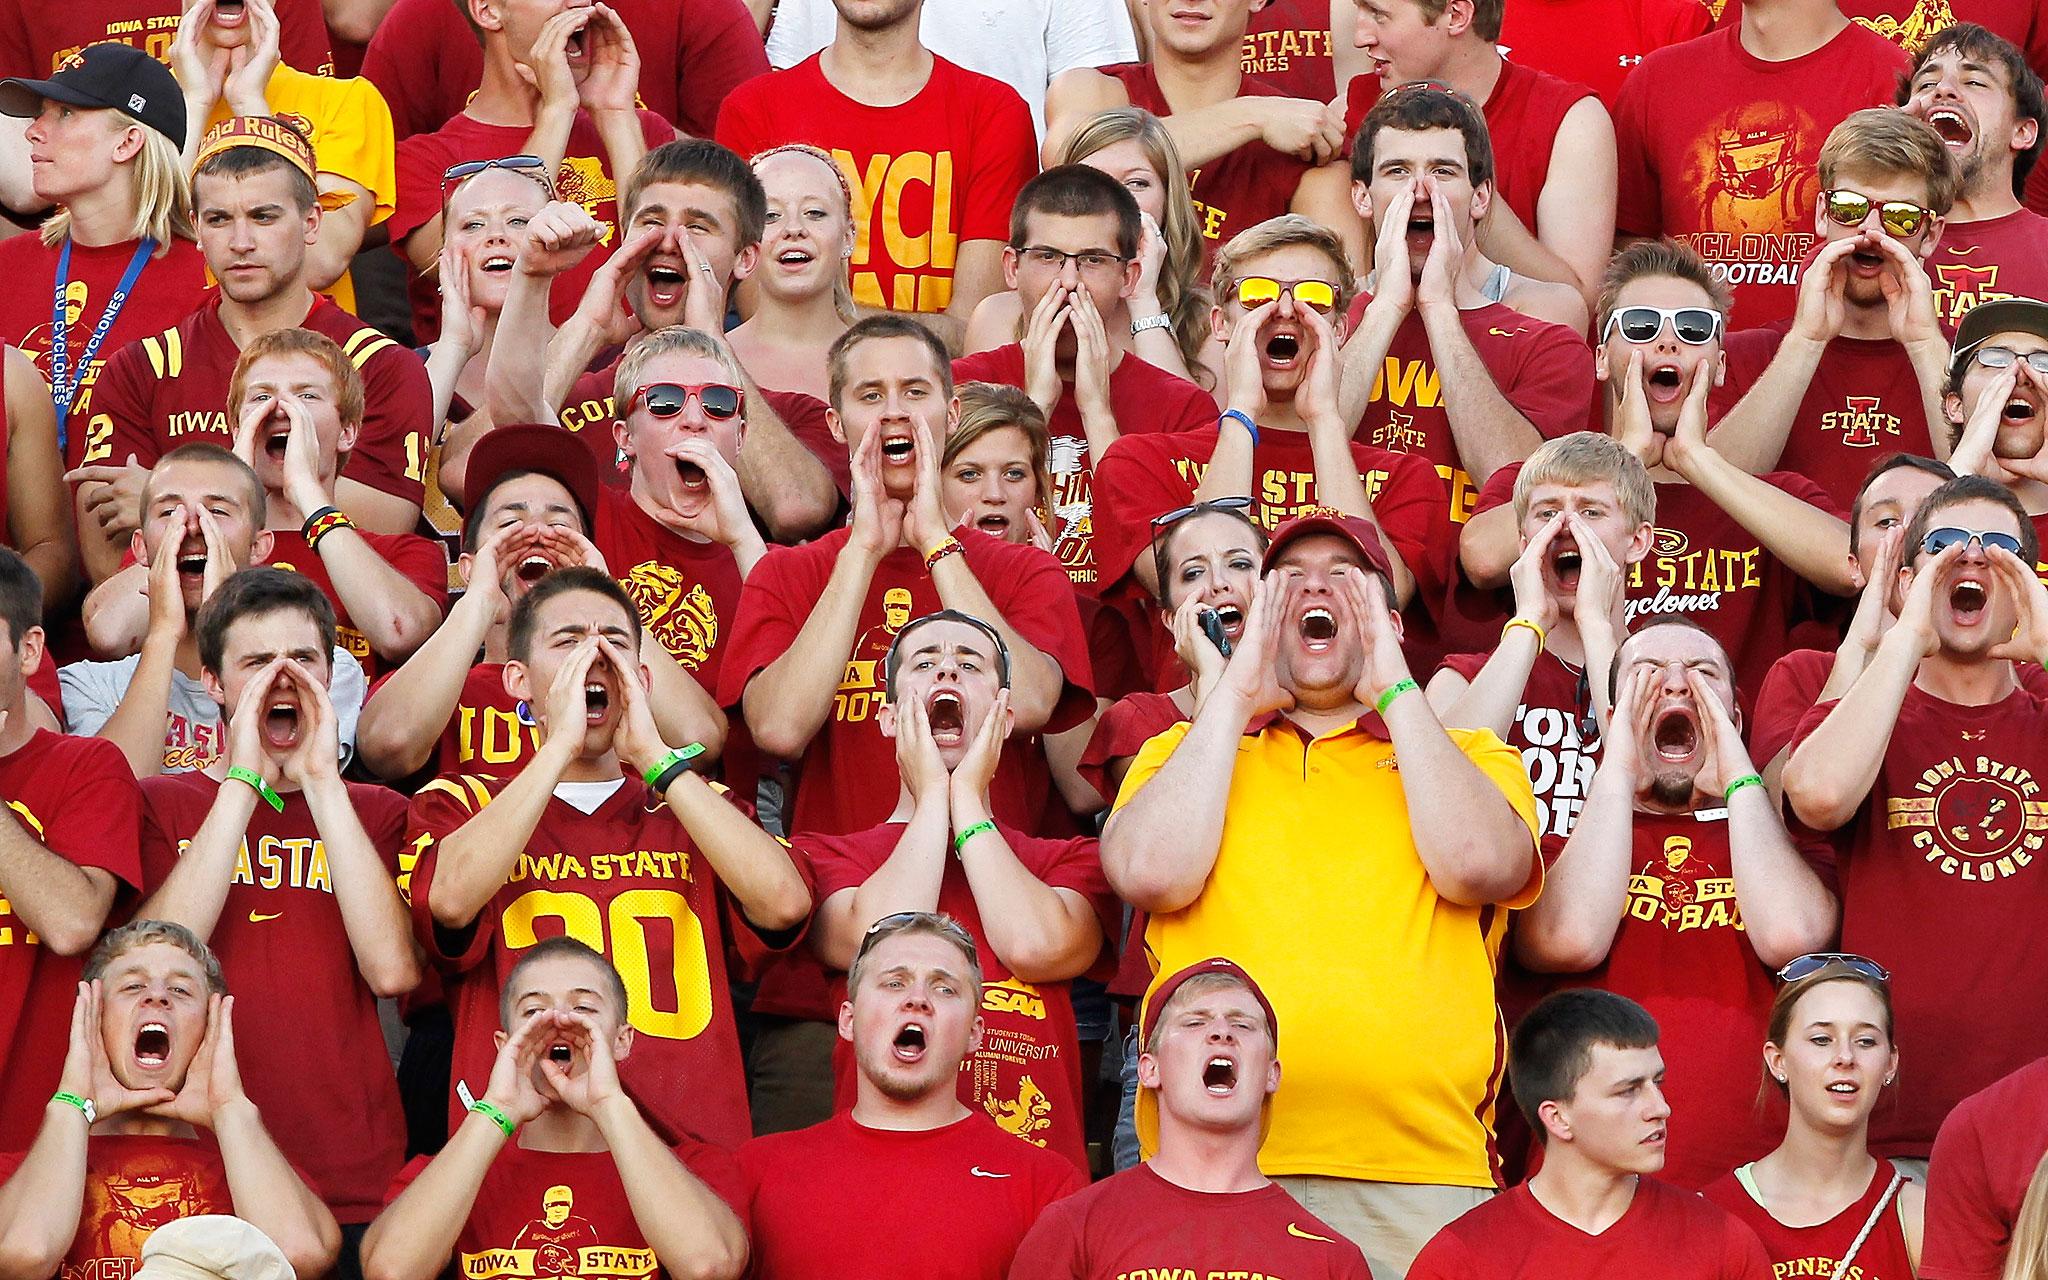 Iowa State Cyclone fans